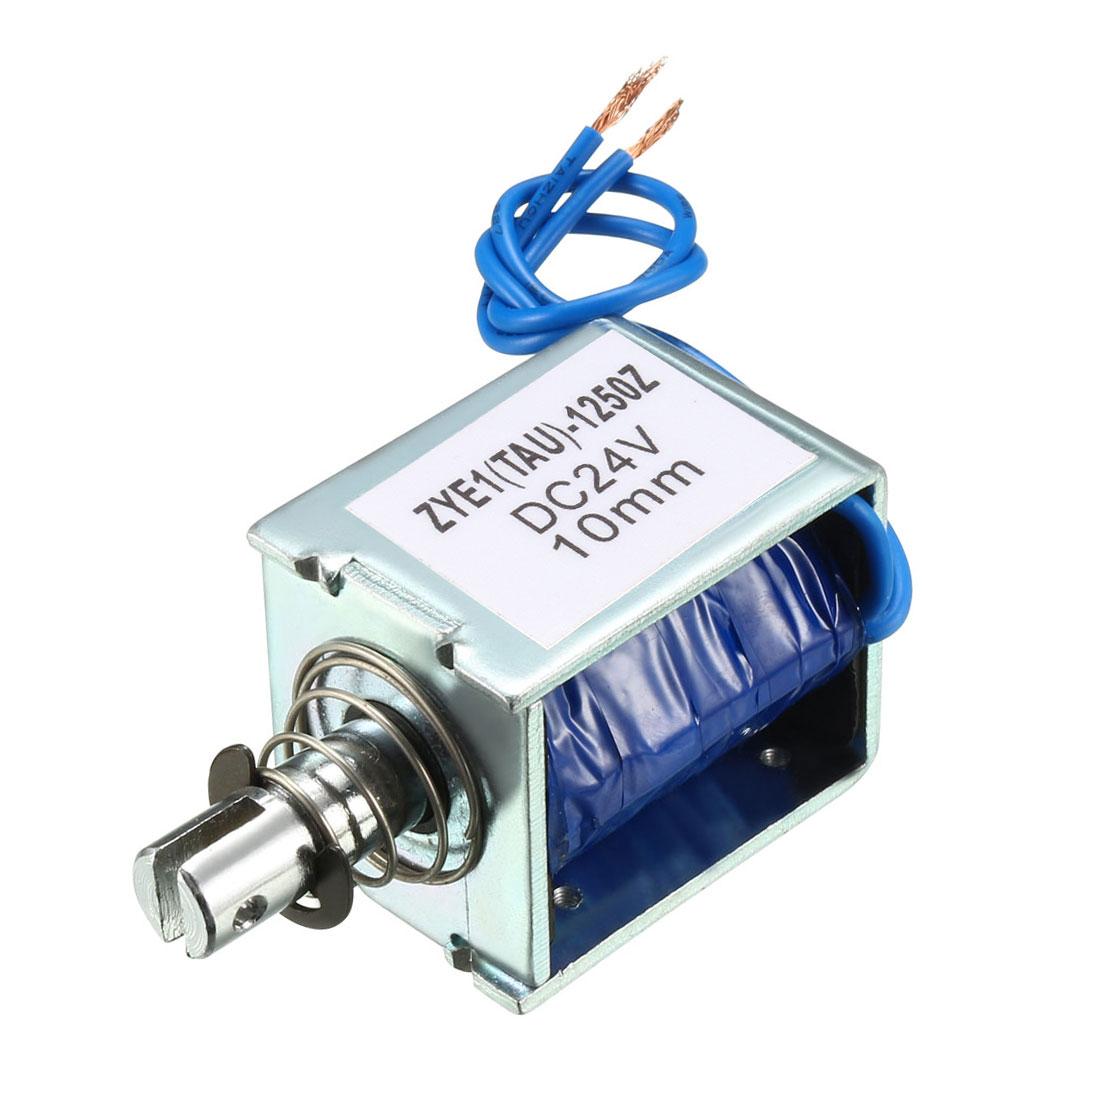 ZYE1(TAU)-1250Z DC 24V Push Pull Type Open Frame Solenoid Electromagnet